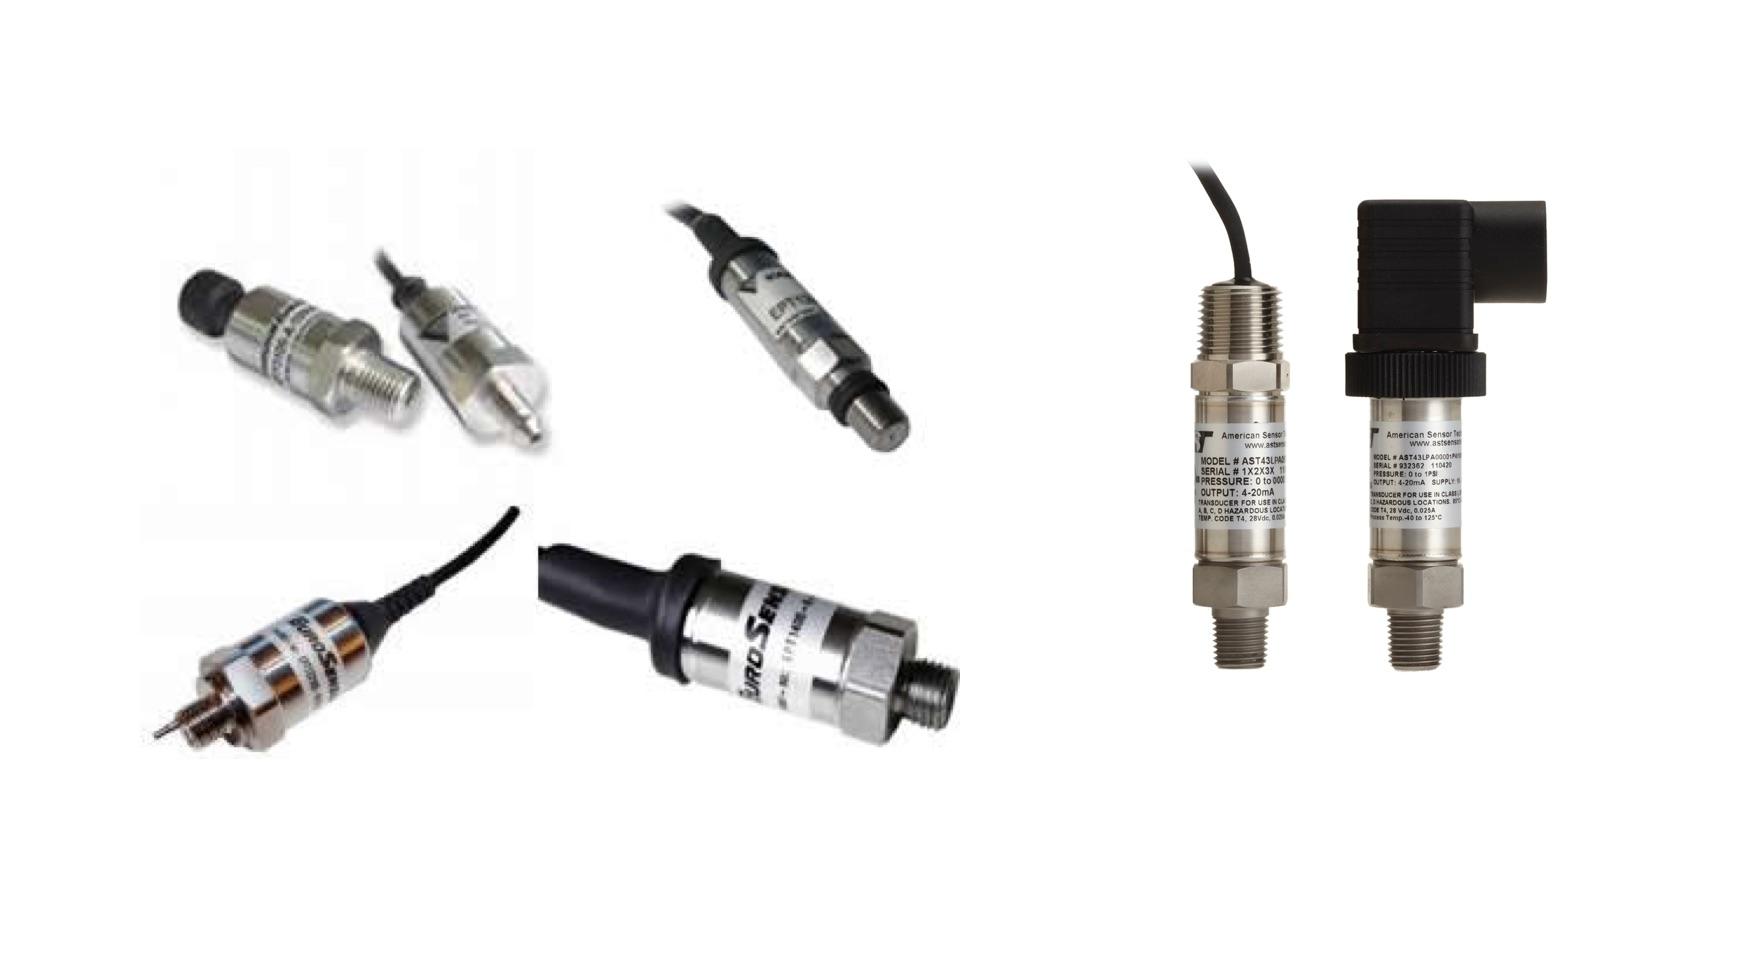 Cảm biến đo áp suất nước 0-10bar - D2415